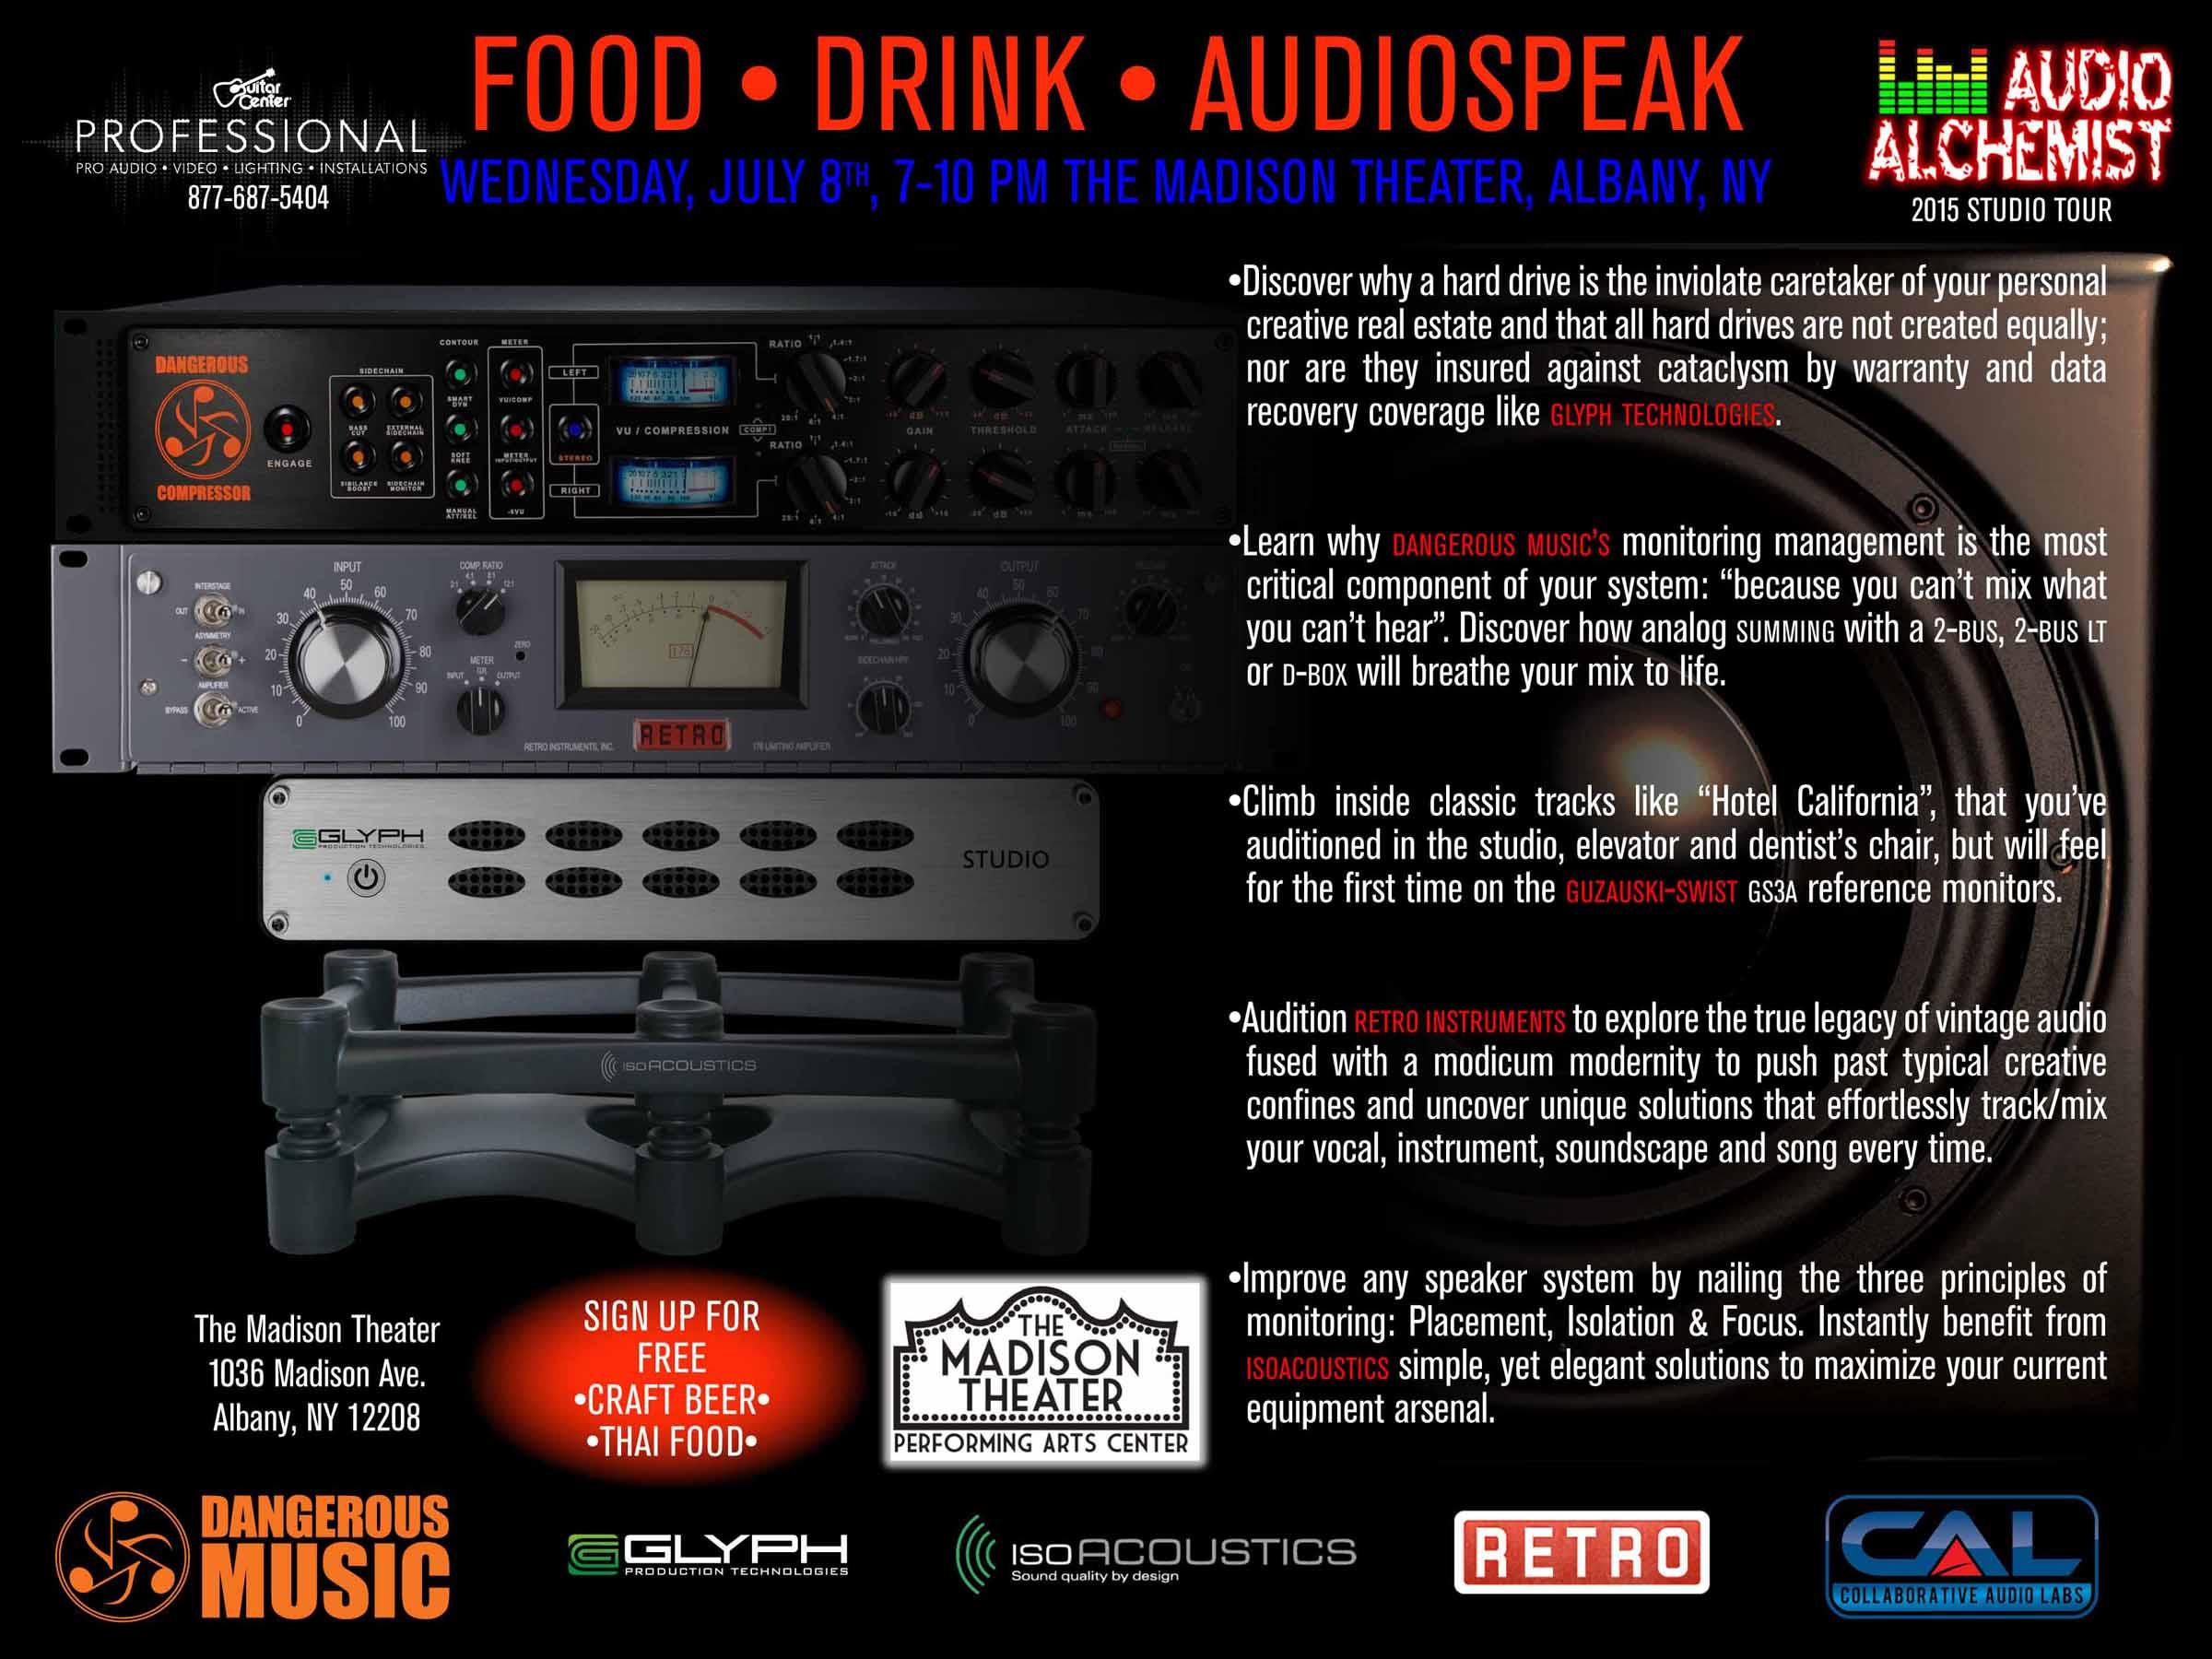 http://www.clynemedia.com/gcpro/AudioAlchemist_Albany/GCPro_AudioAlchemist_Albany_Invite.jpg